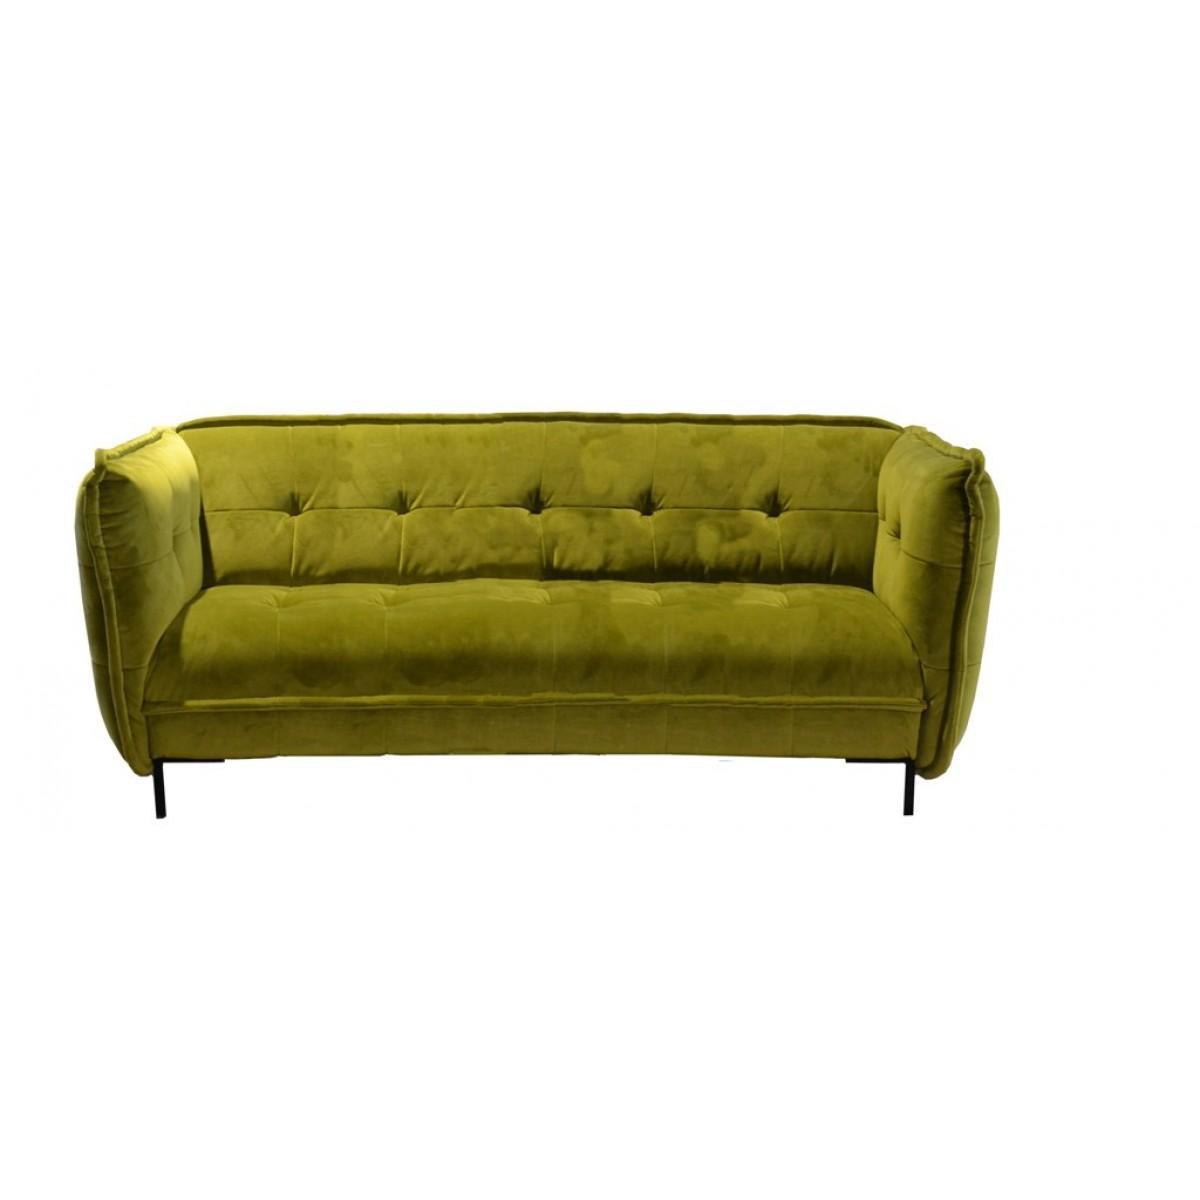 2,5-zits-bank_fauteuil_slimm_jim_patch_stof_seven_cognac_leer_tom_club_easy_sofa